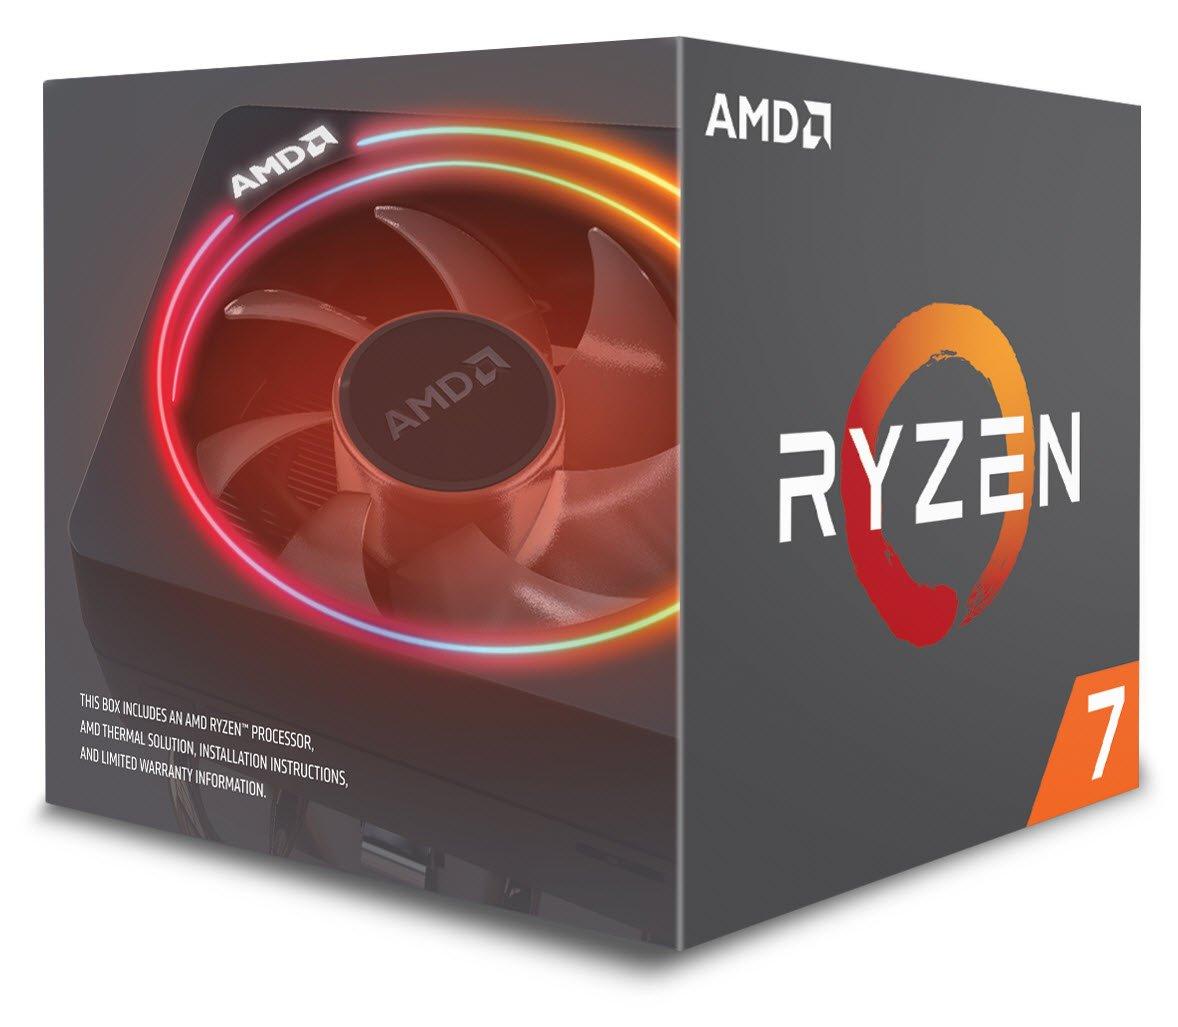 AMD Ryzen 7 2700X Processor with Wraith Prism RGB LED Cooler - YD270XBGAFBOX £193.64 (used like new warehouse deal) - Amazon